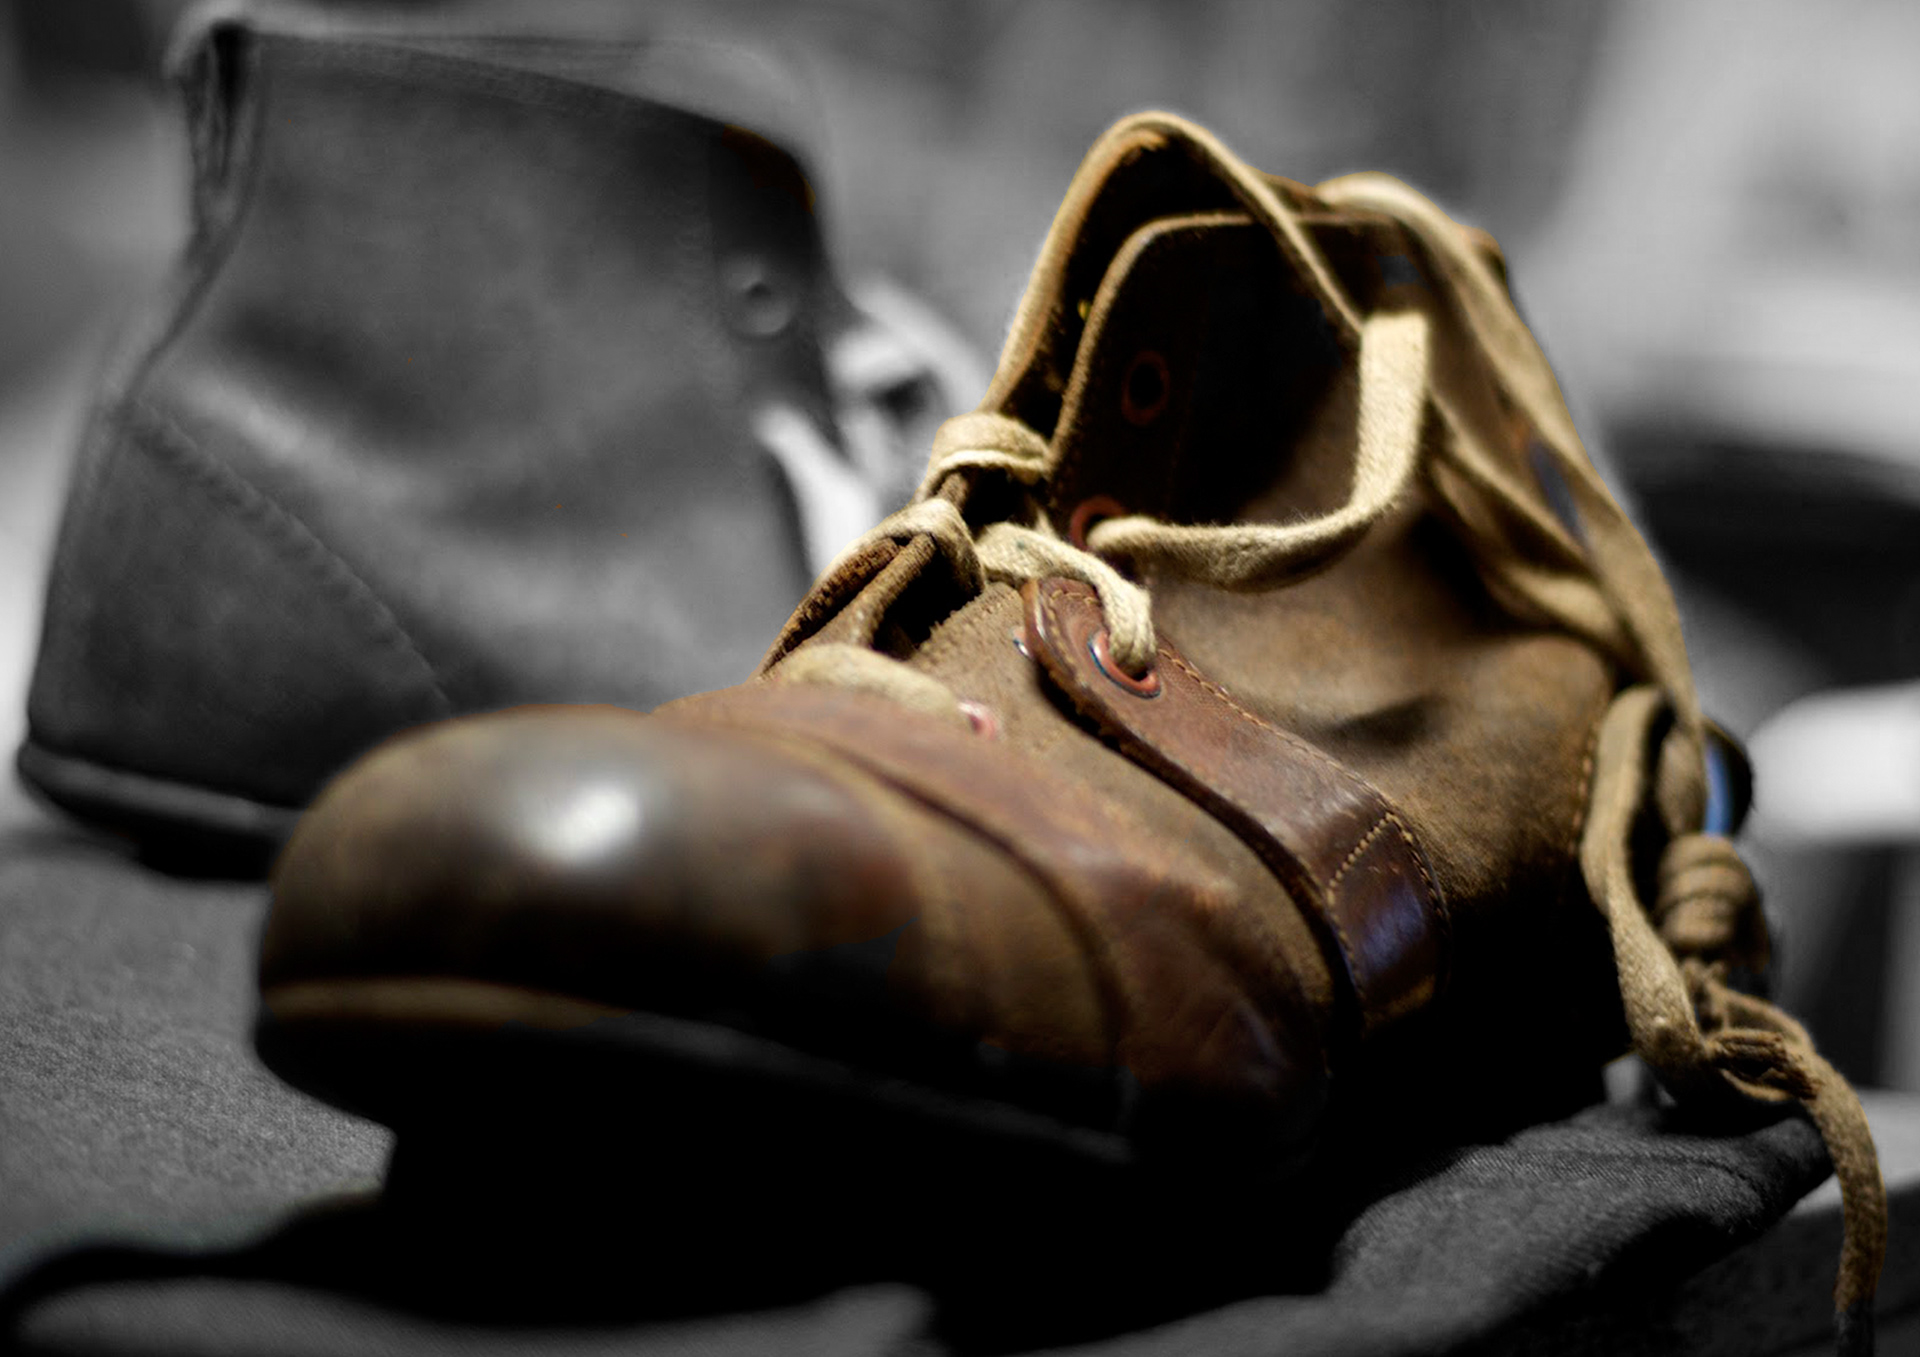 Football_boots